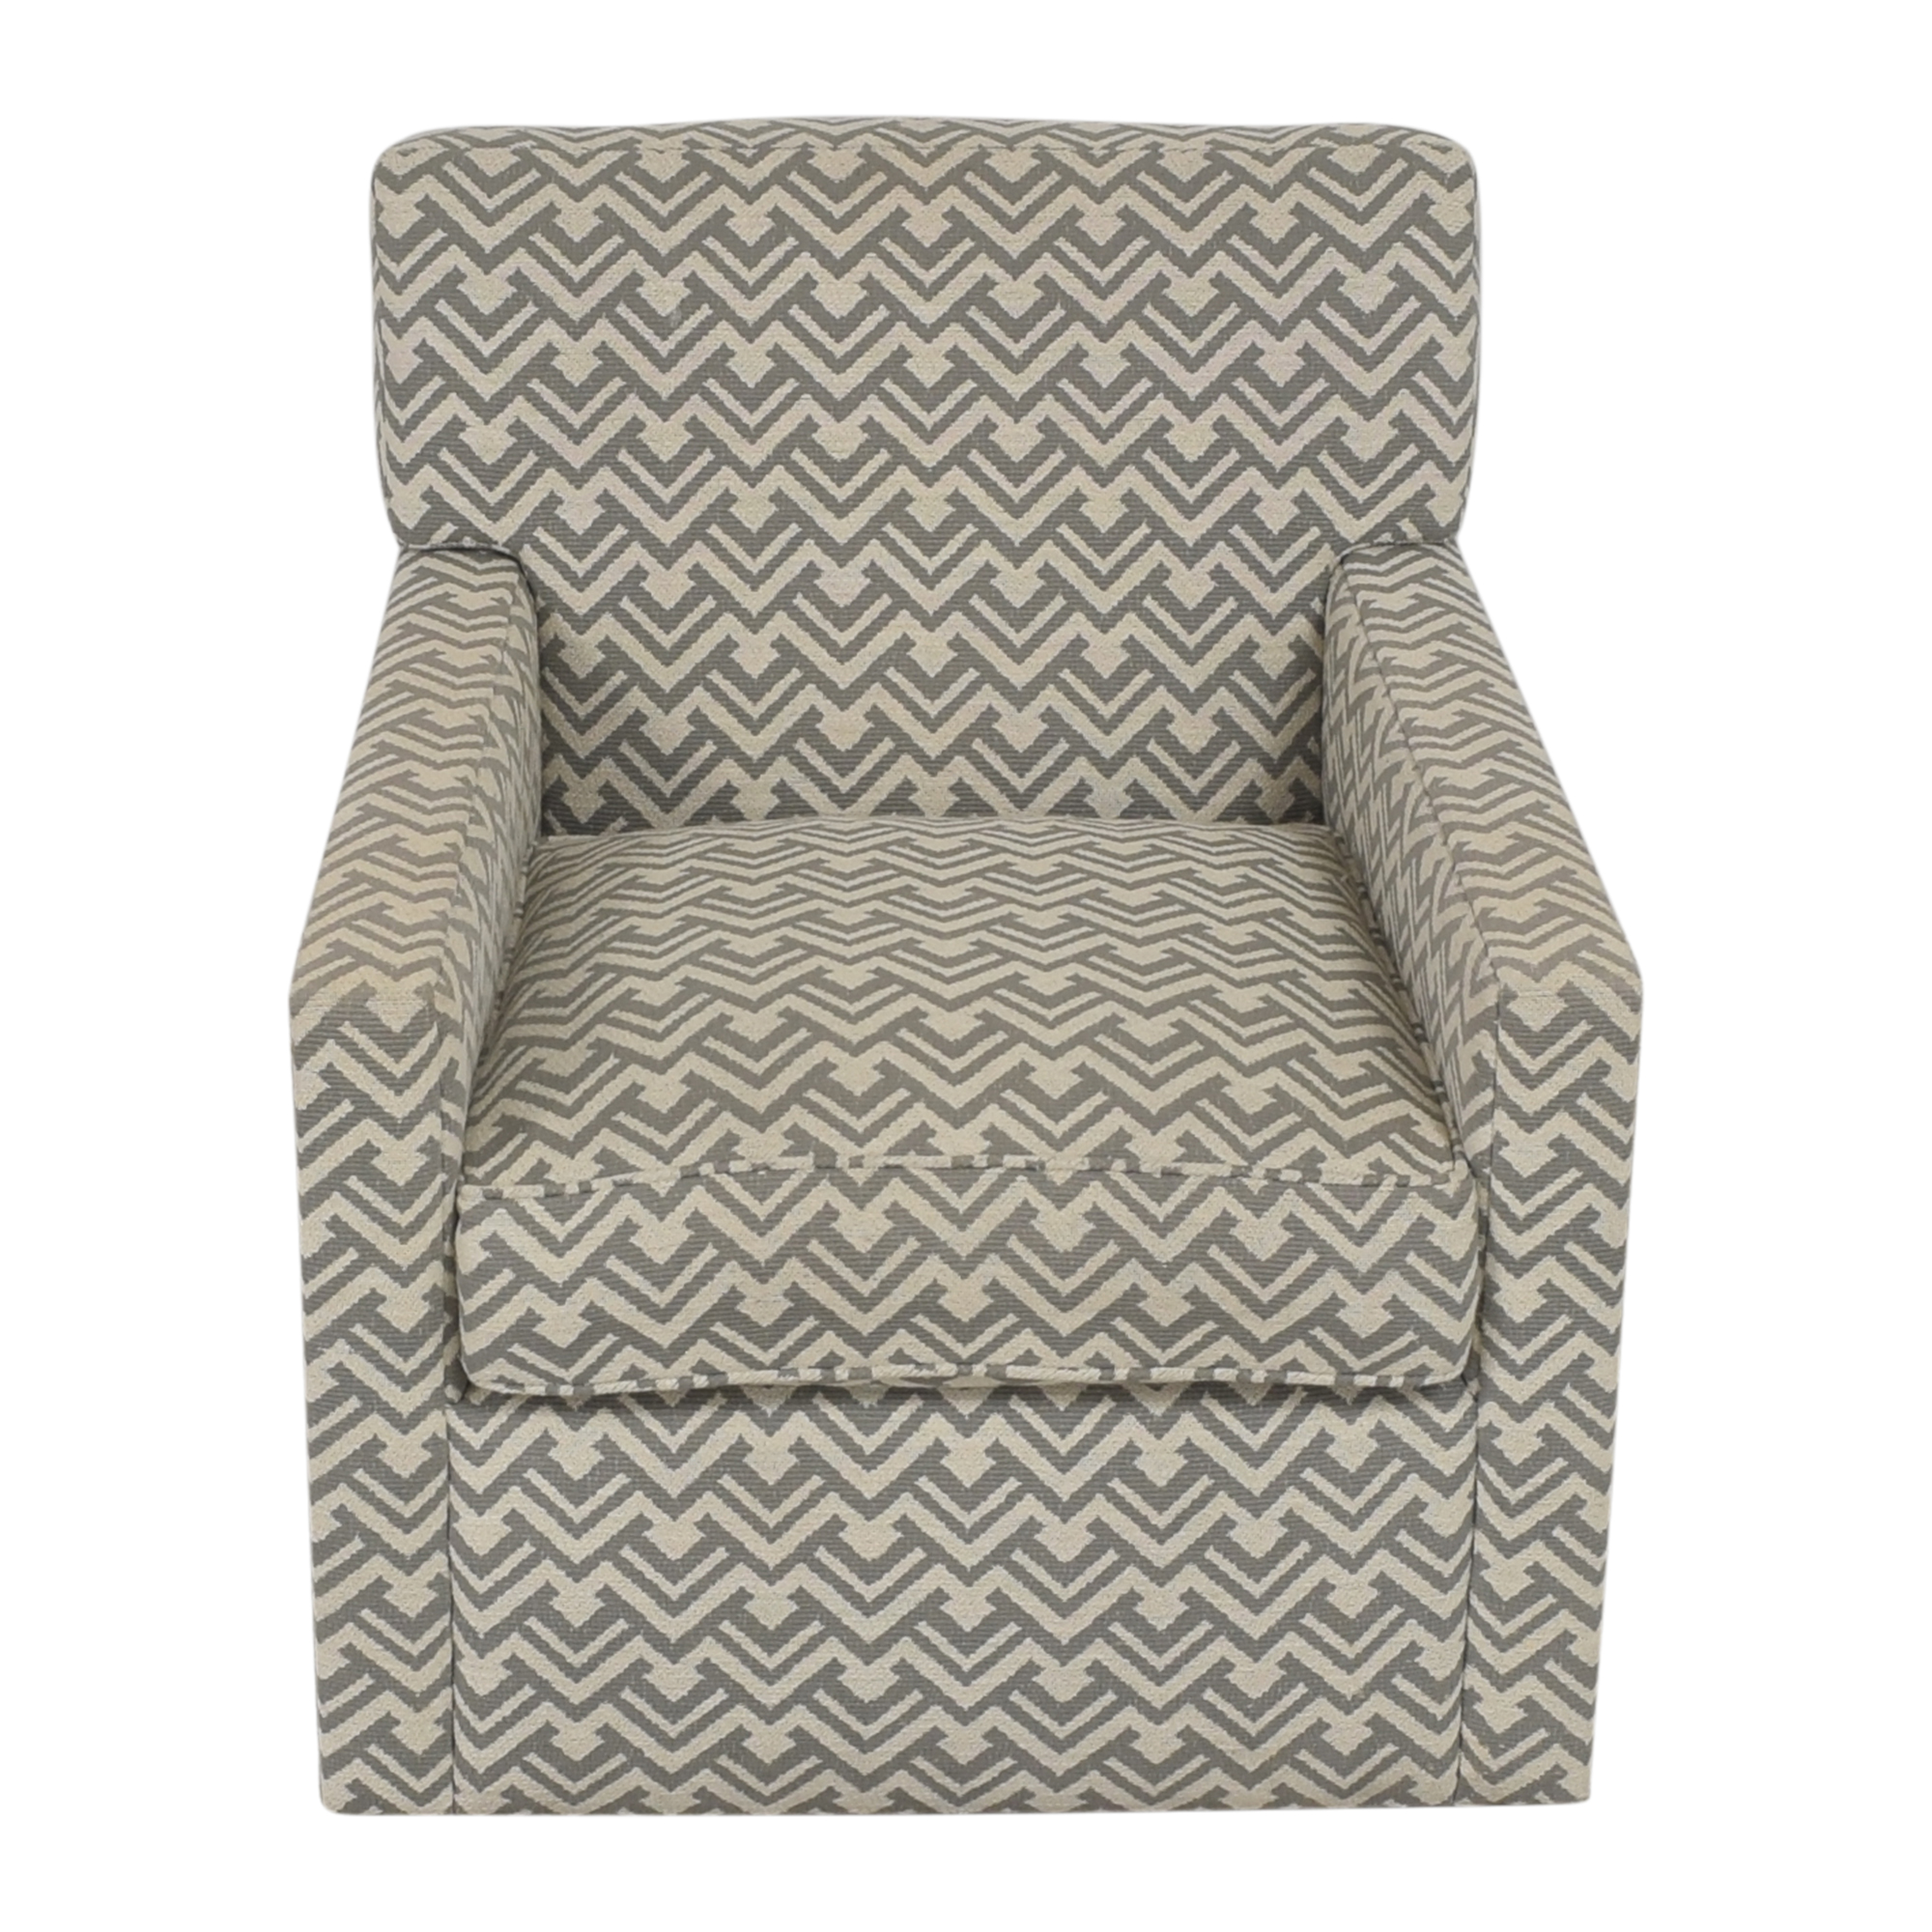 A Rudin A Rudin Lounge Chair